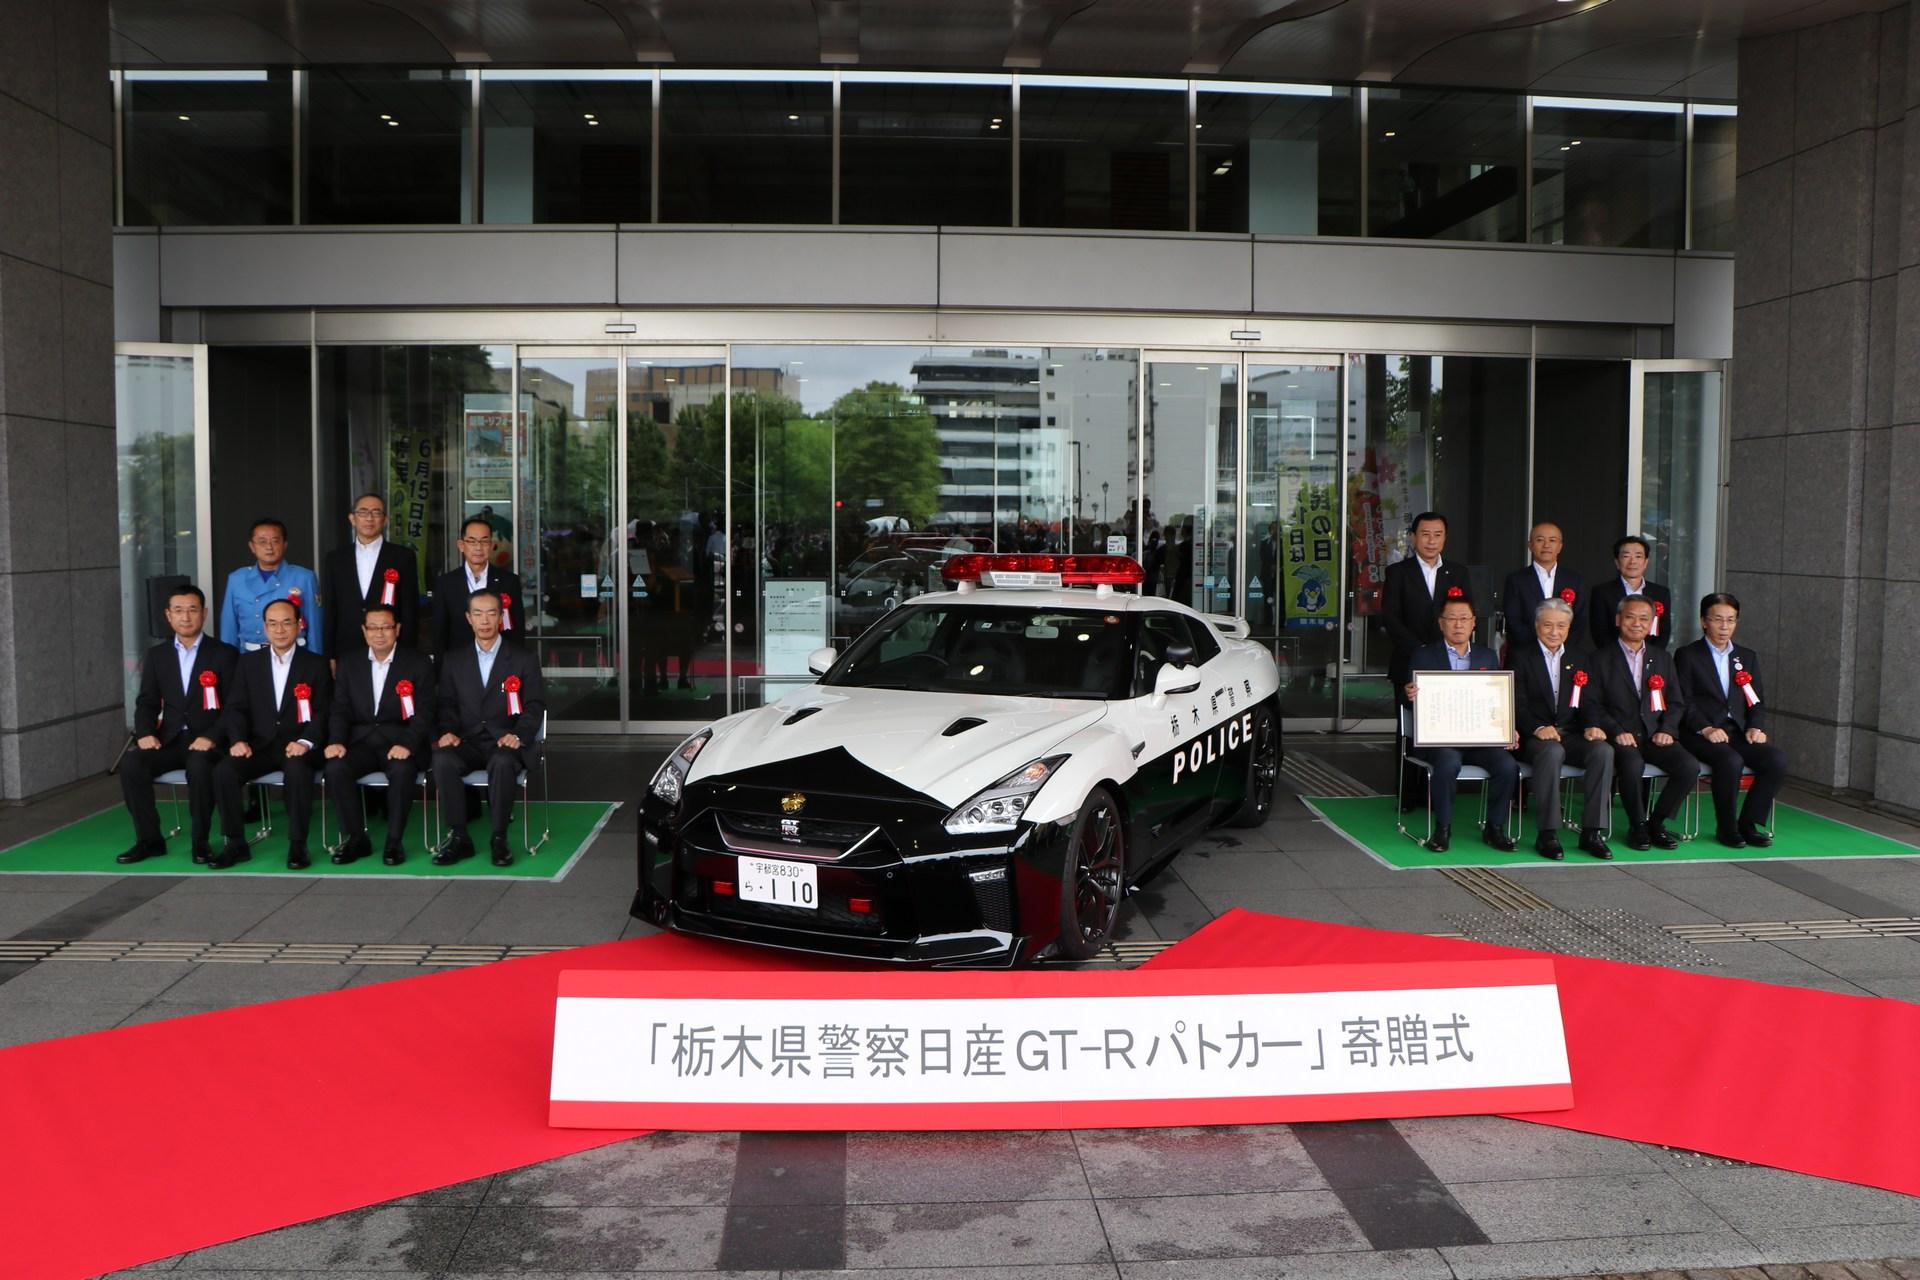 Nissan_GT-R_Police_Car_0010